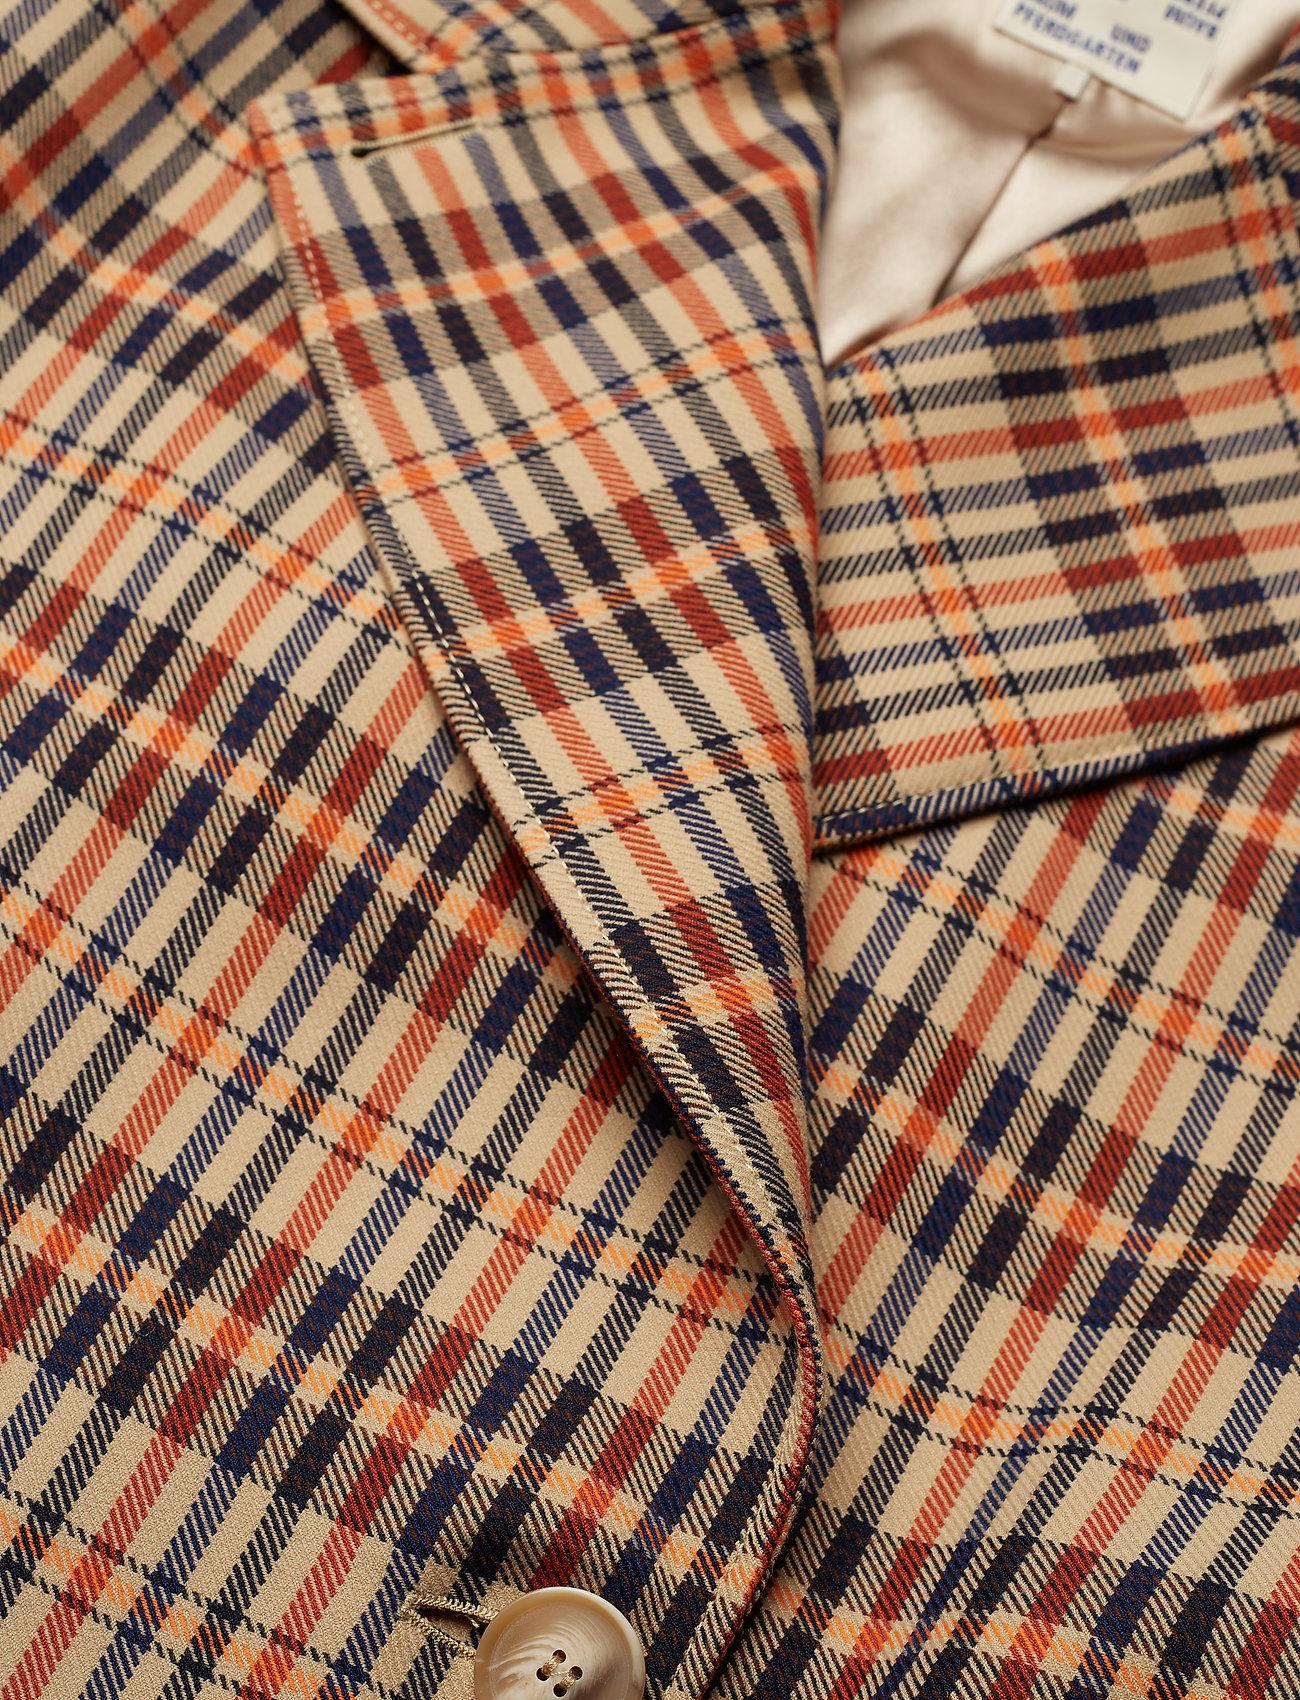 CheckBaum Mandarin Und CheckBaum Deidracamel Pferdgarten Pferdgarten Und Mandarin Deidracamel Mandarin Deidracamel P8nk0wO